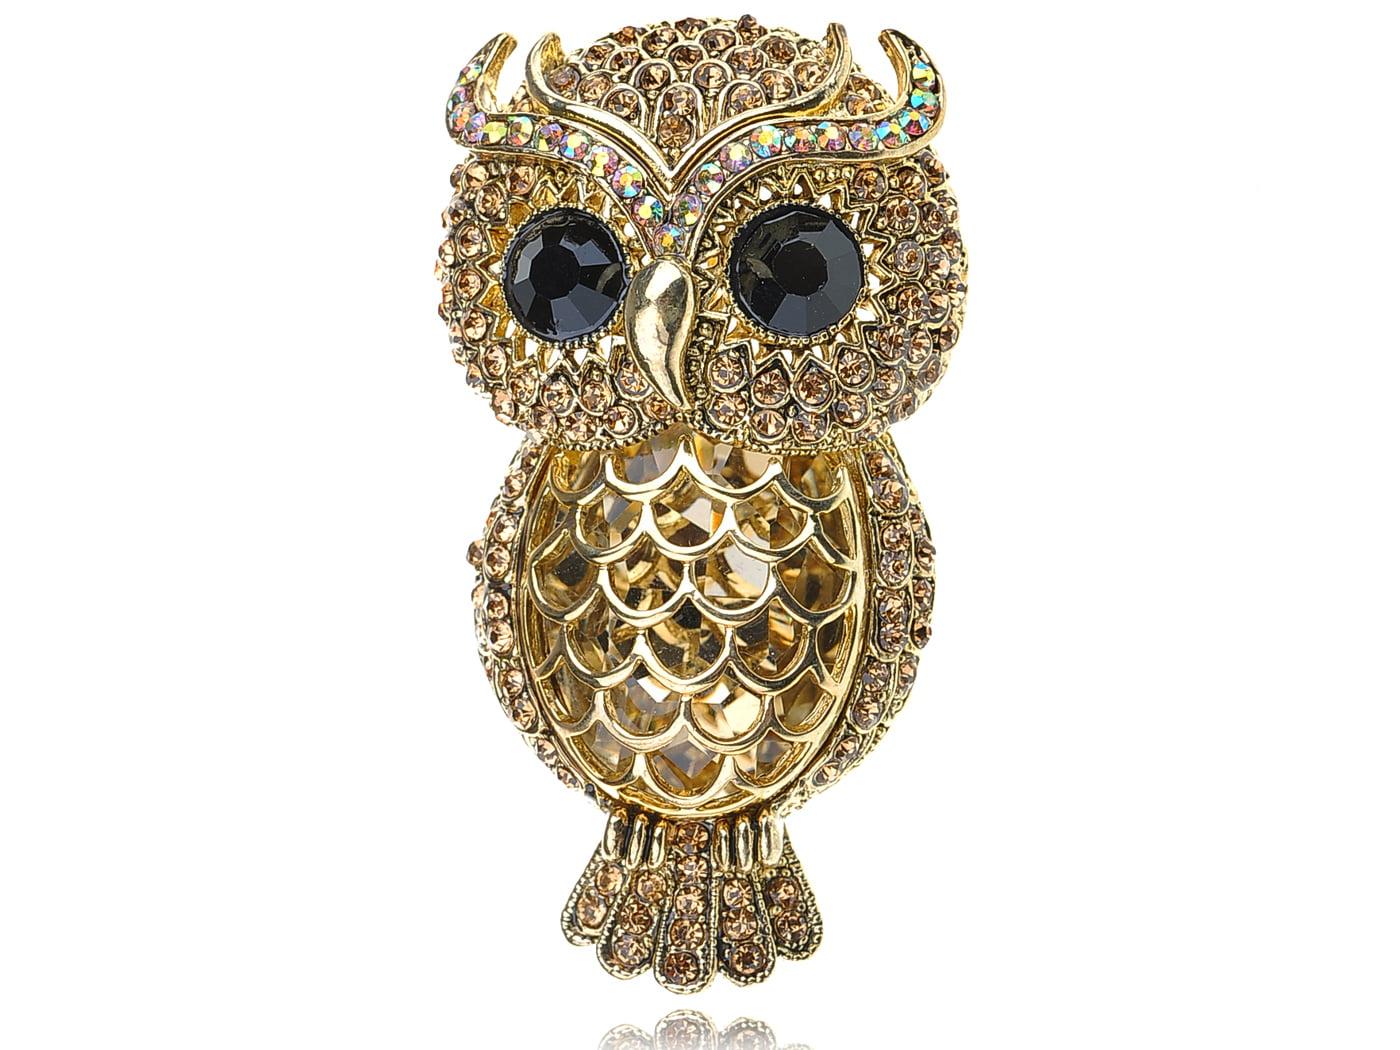 Stunning Captivating Topaz Crystal Rhinestone Big Eyed Owl Bird Pin Brooch by